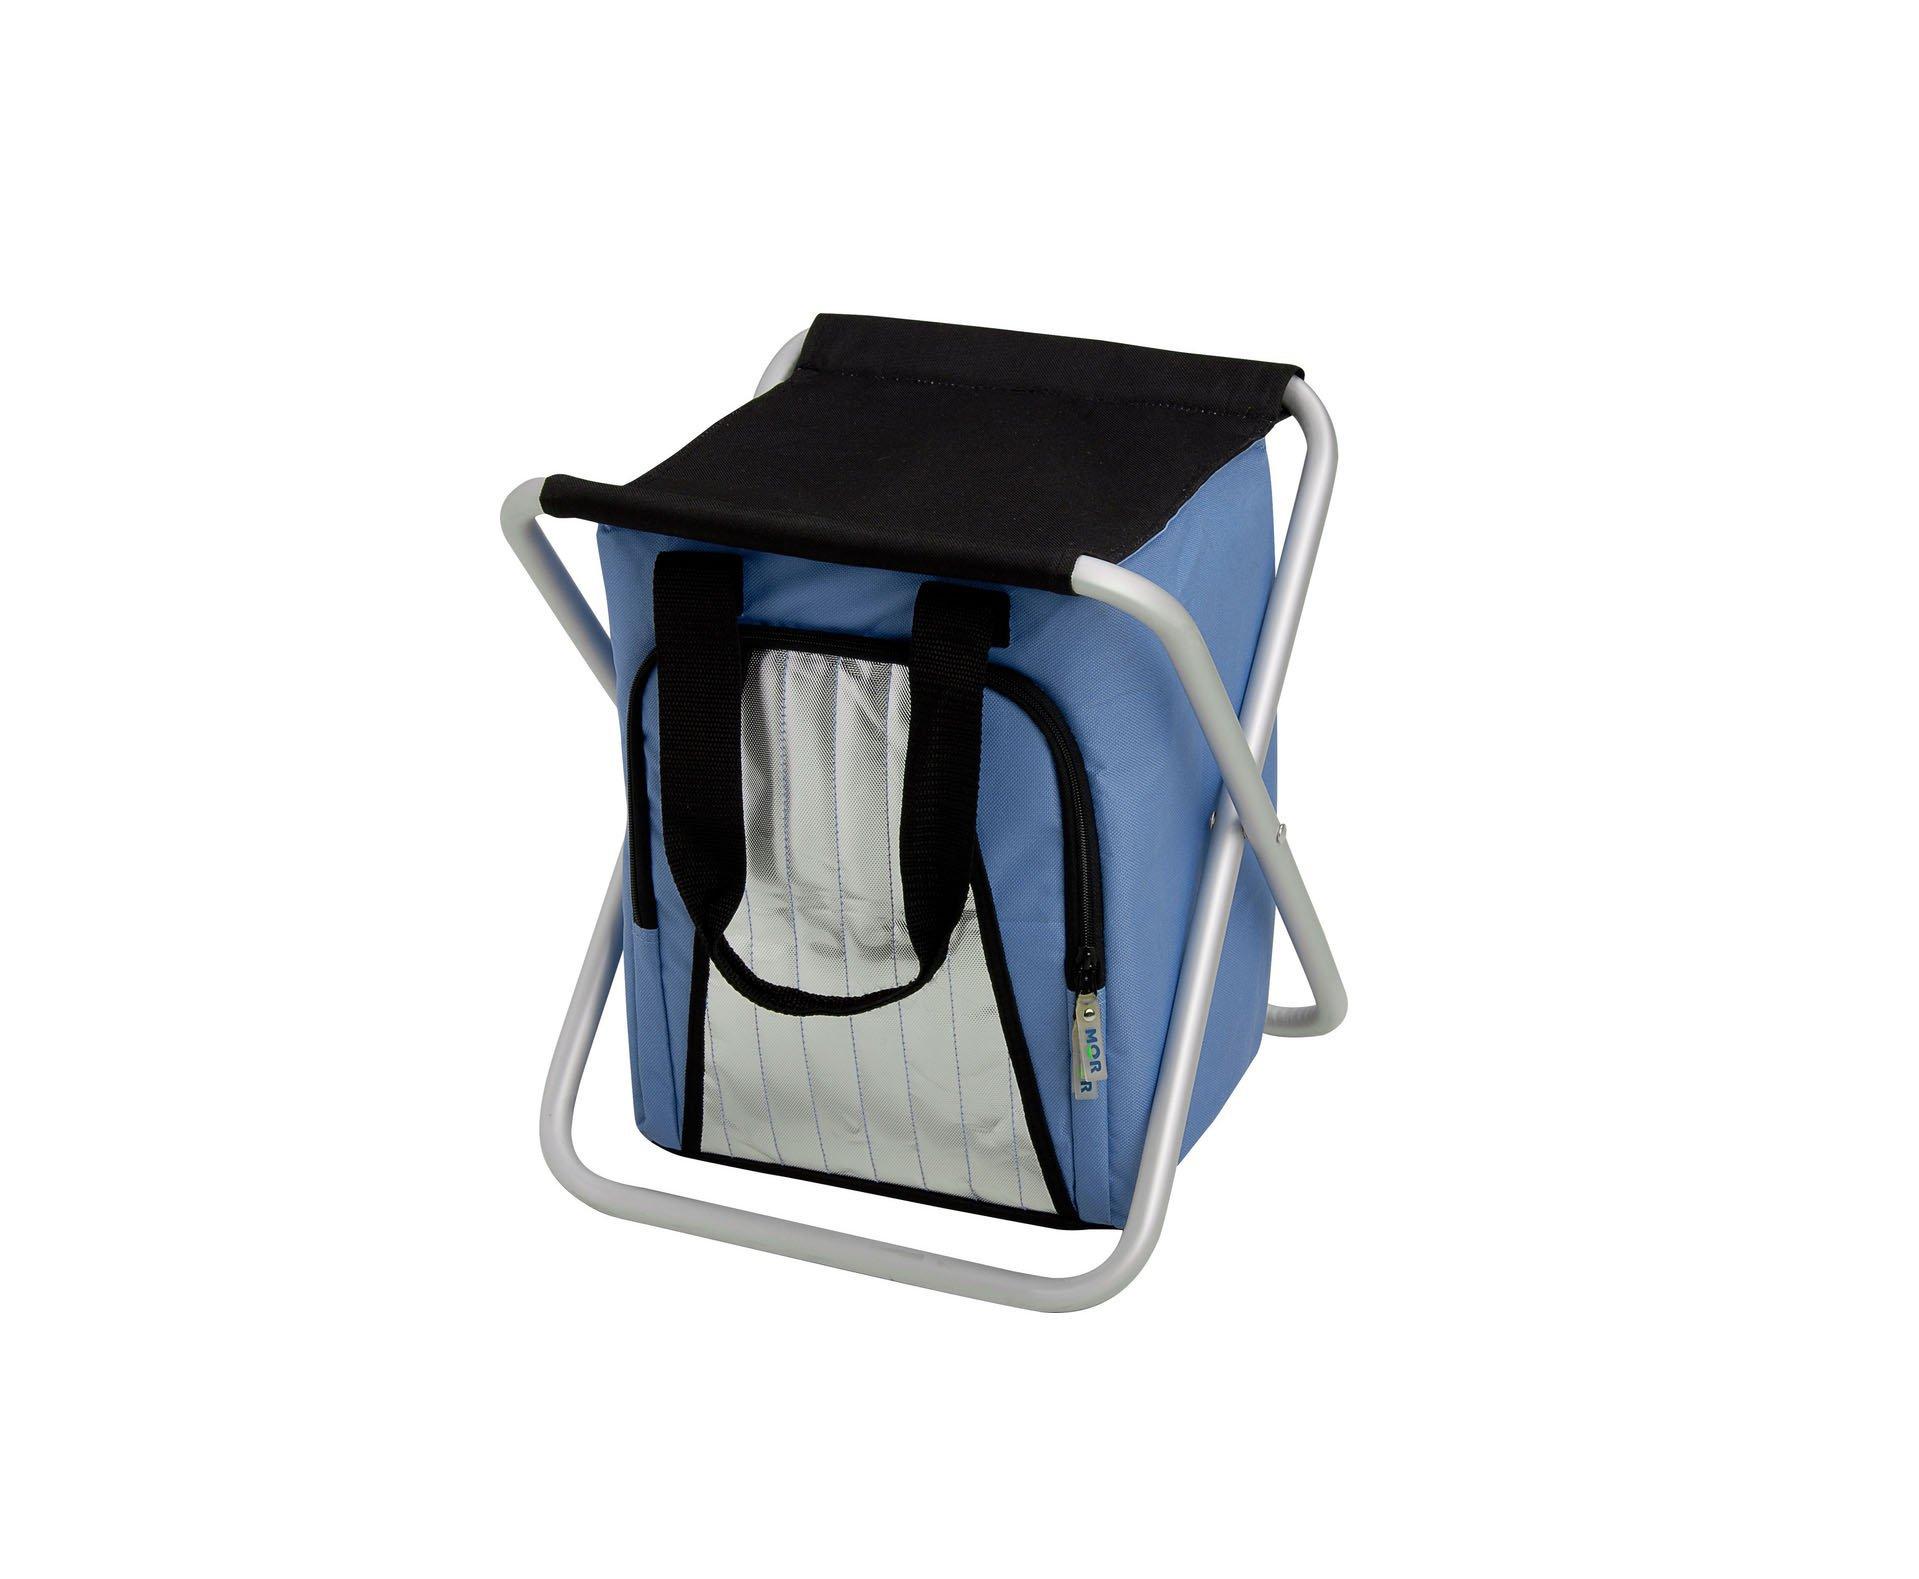 Banqueta Camping Dobravel + Cooler Termico 25l - Mor